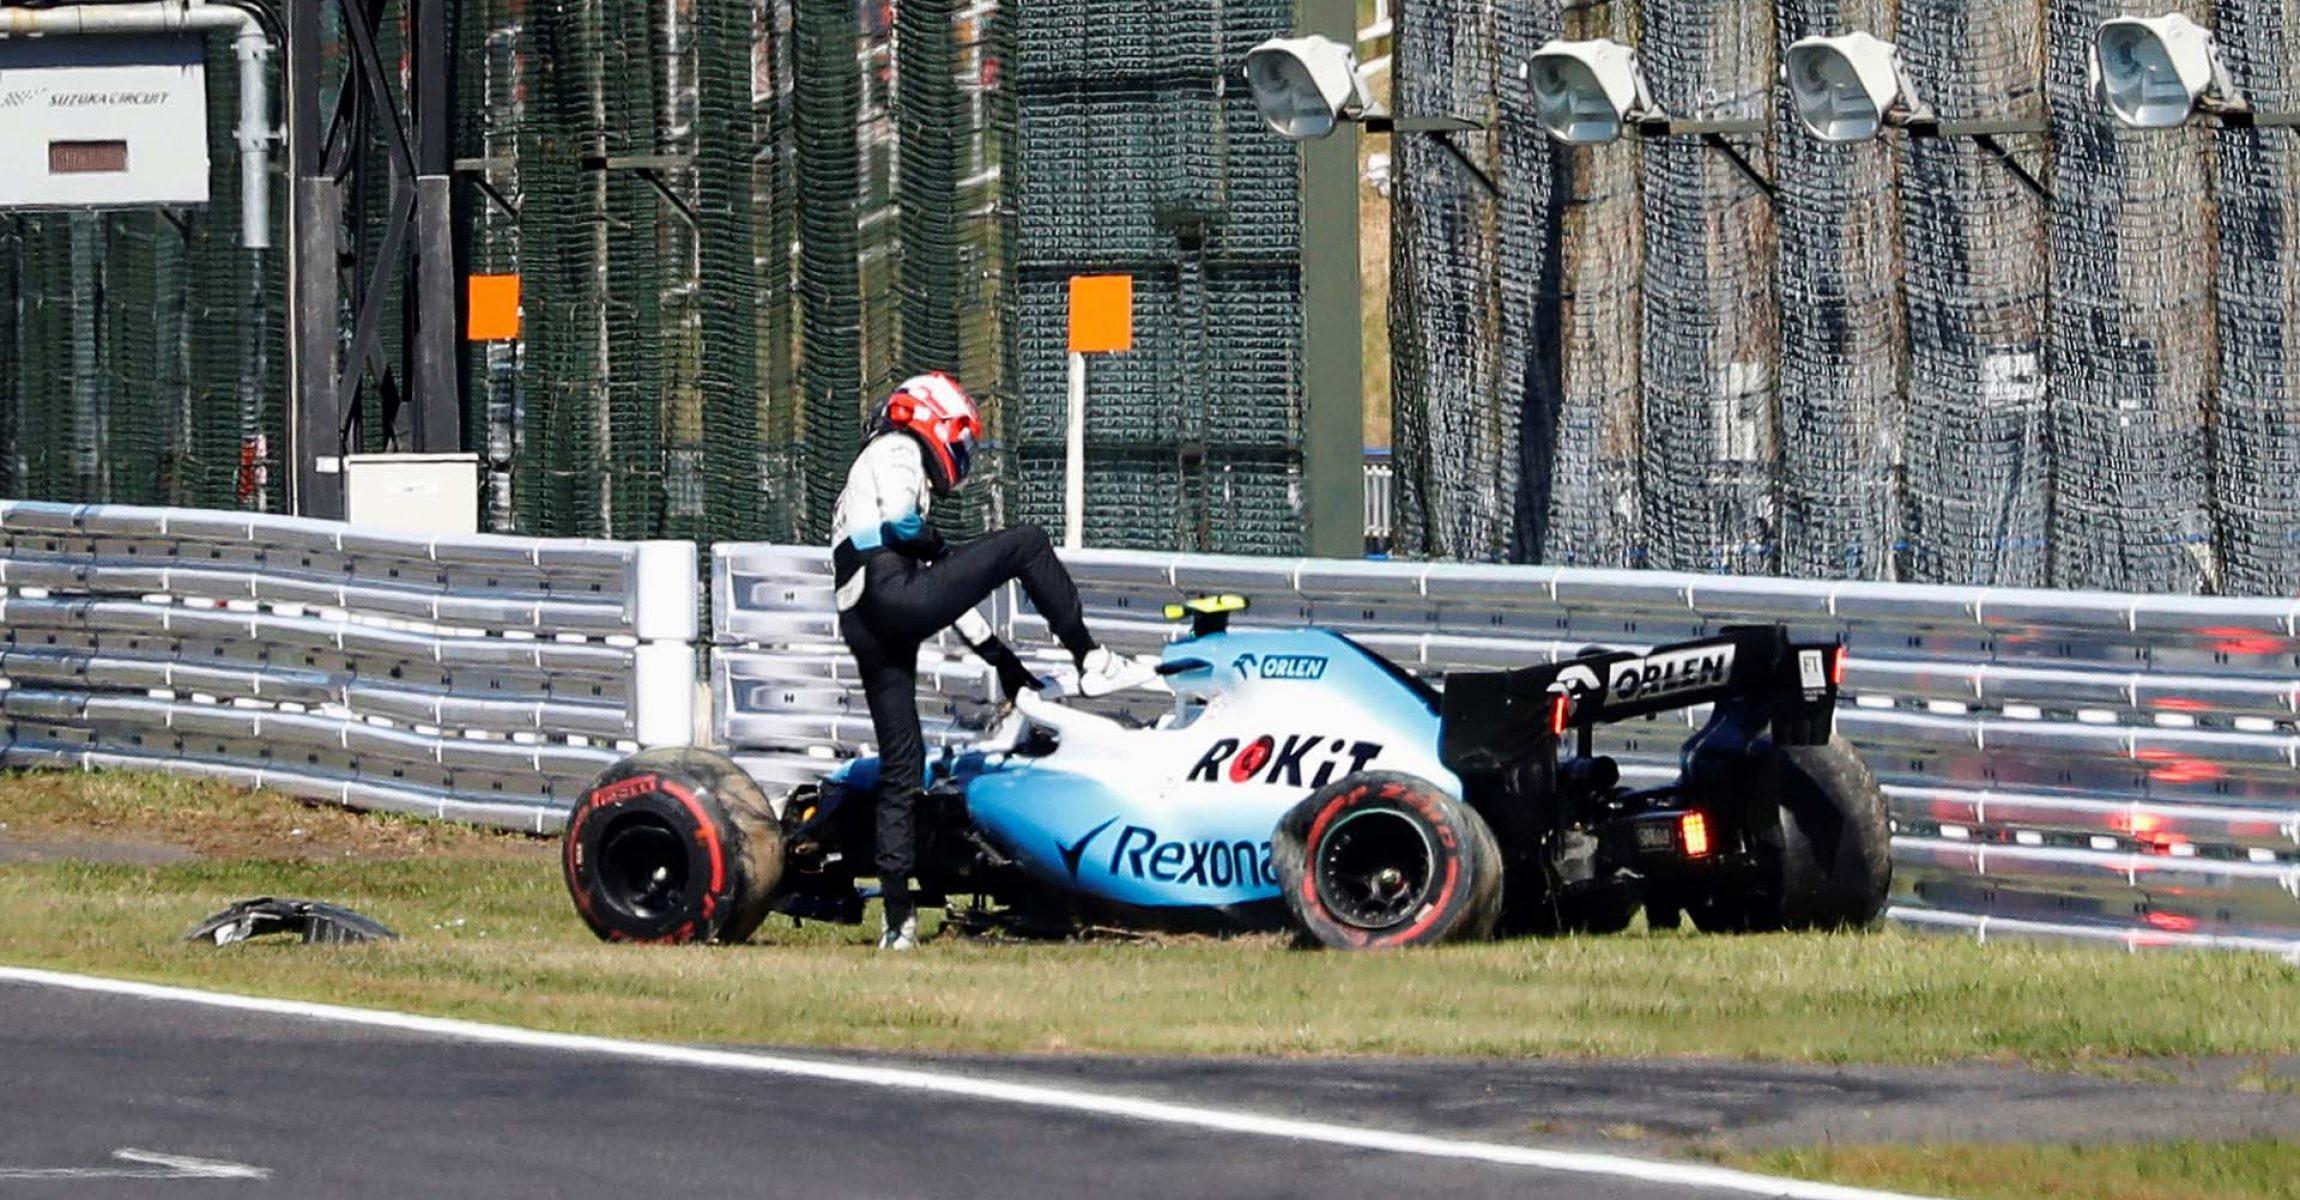 Formula One F1 - Japanese Grand Prix - Suzuka Circuit, Suzuka, Japan - October 13, 2019 Williams' Robert Kubica gets off from his machine after crashing during qualifying REUTERS/Kim Hong-Ji/Pool